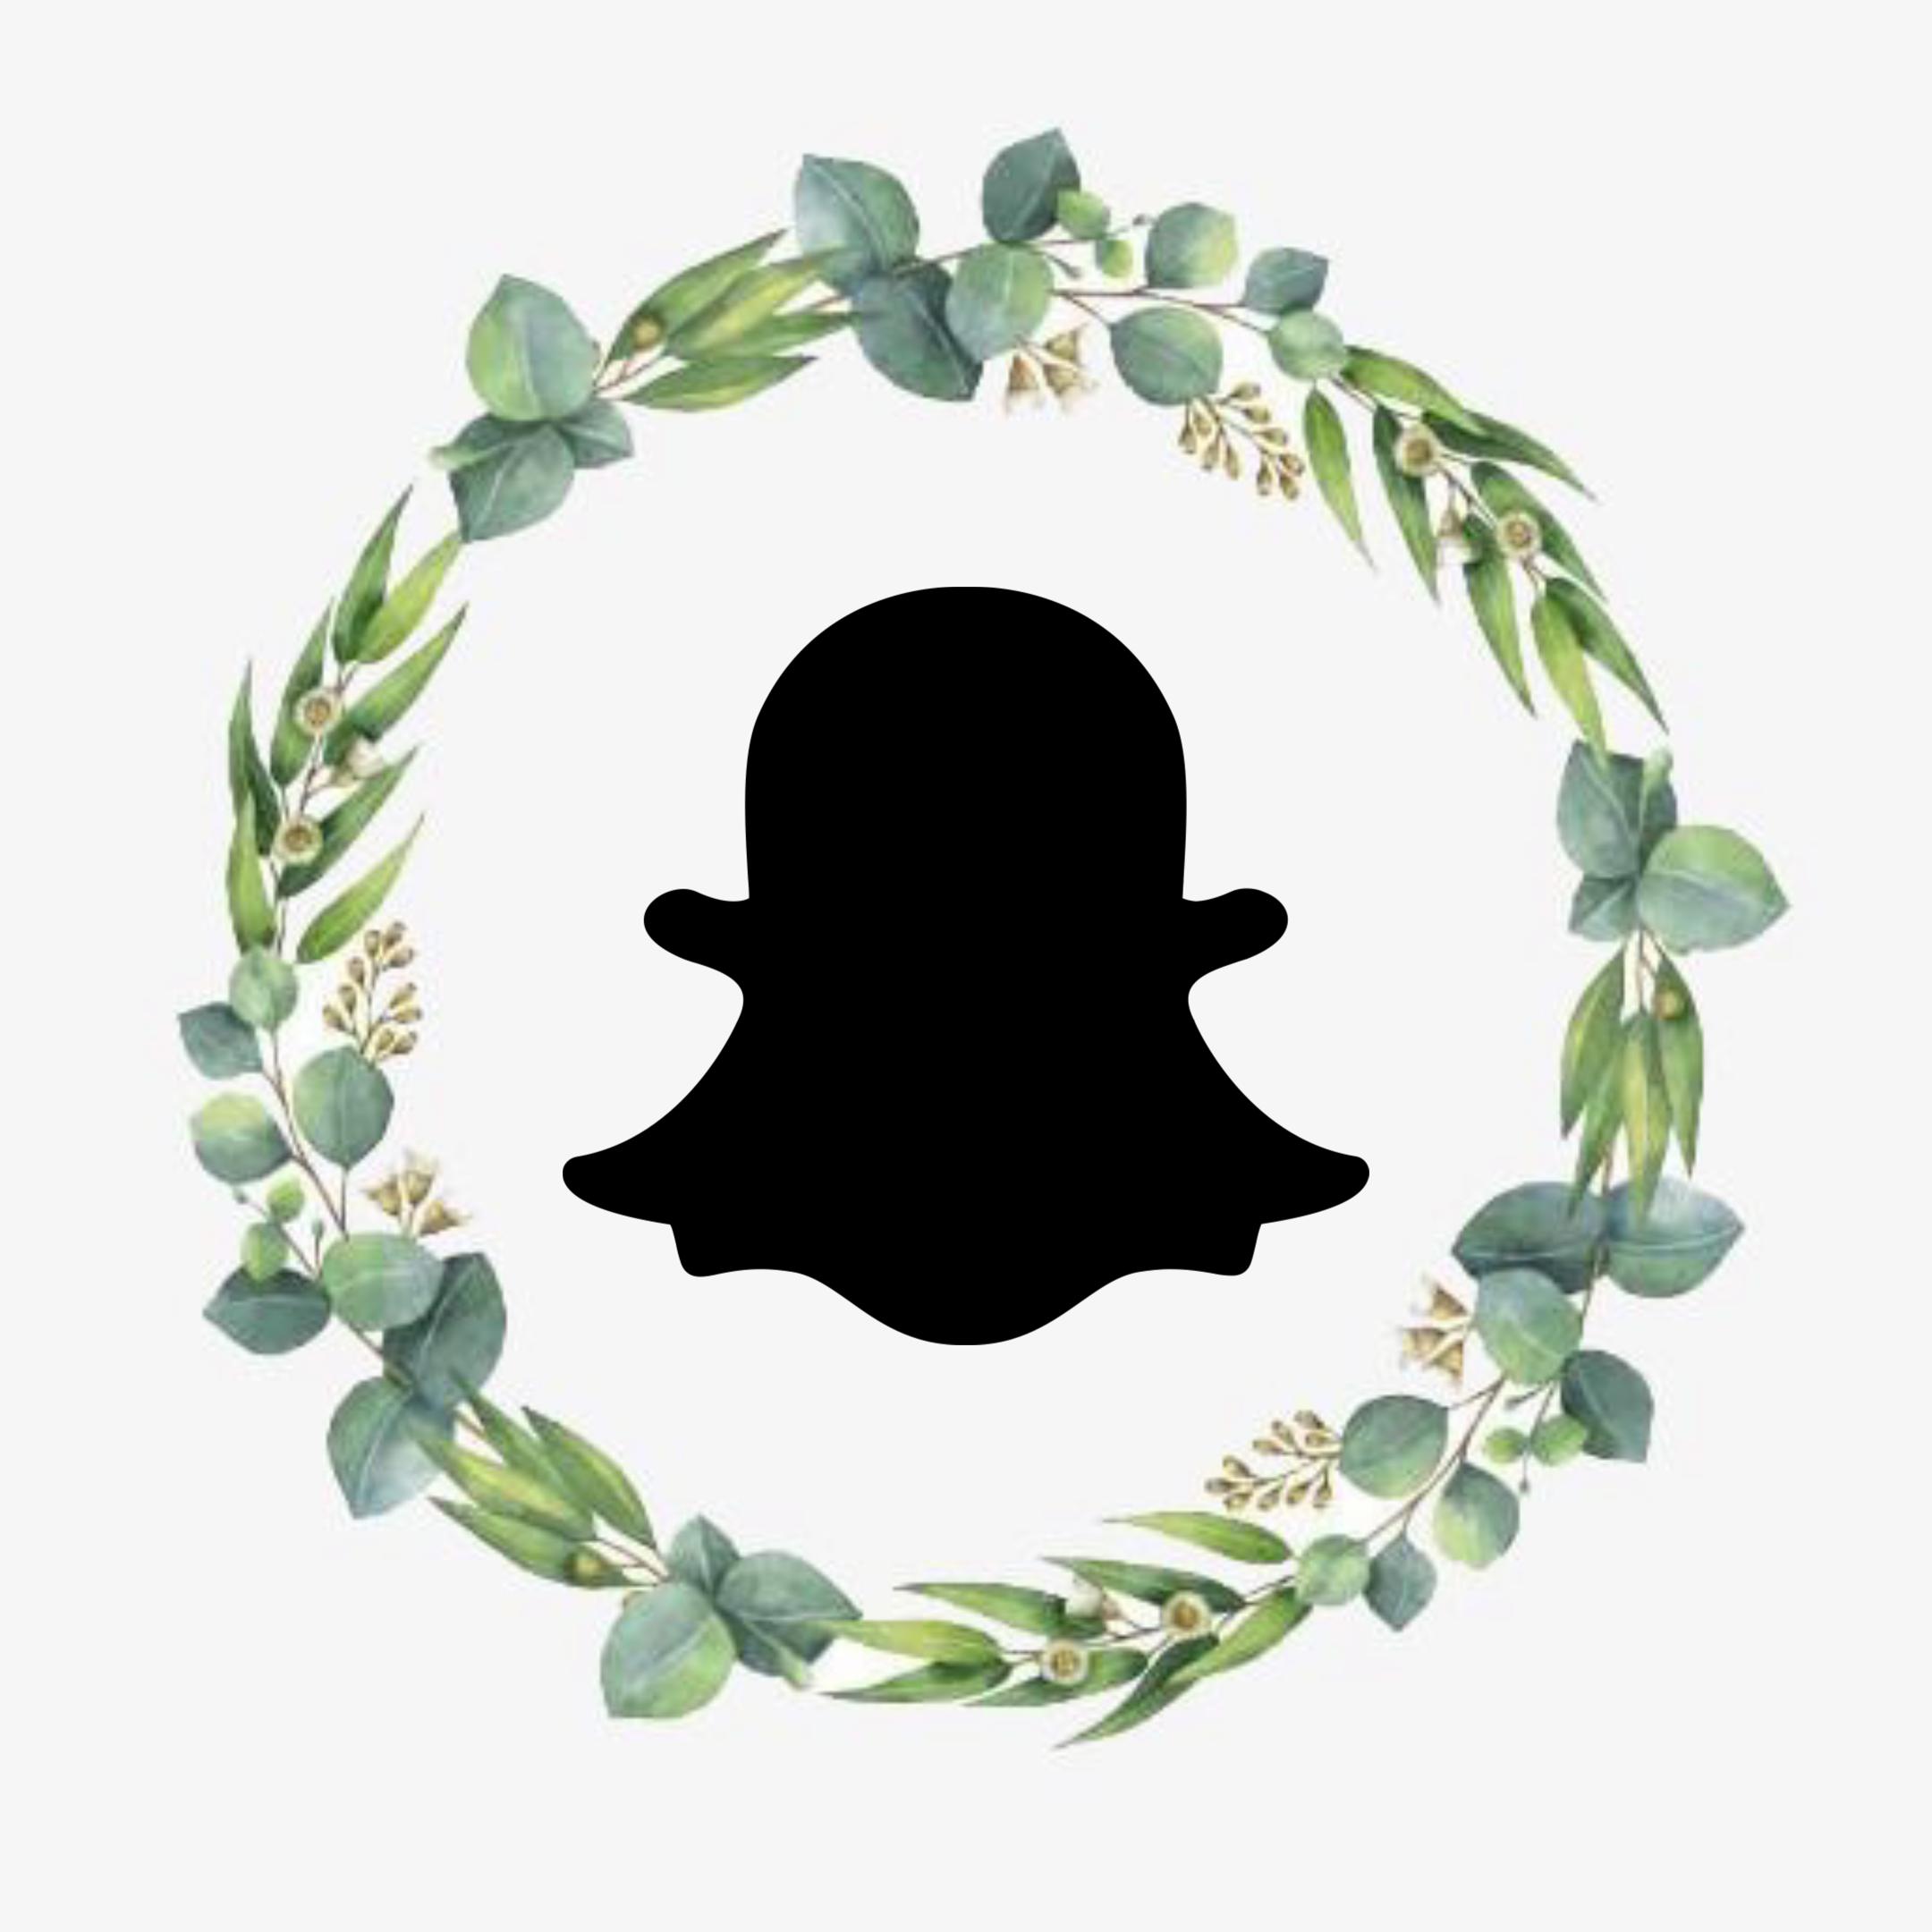 Green Wreath Instagram icons, Instagram, Green wreath